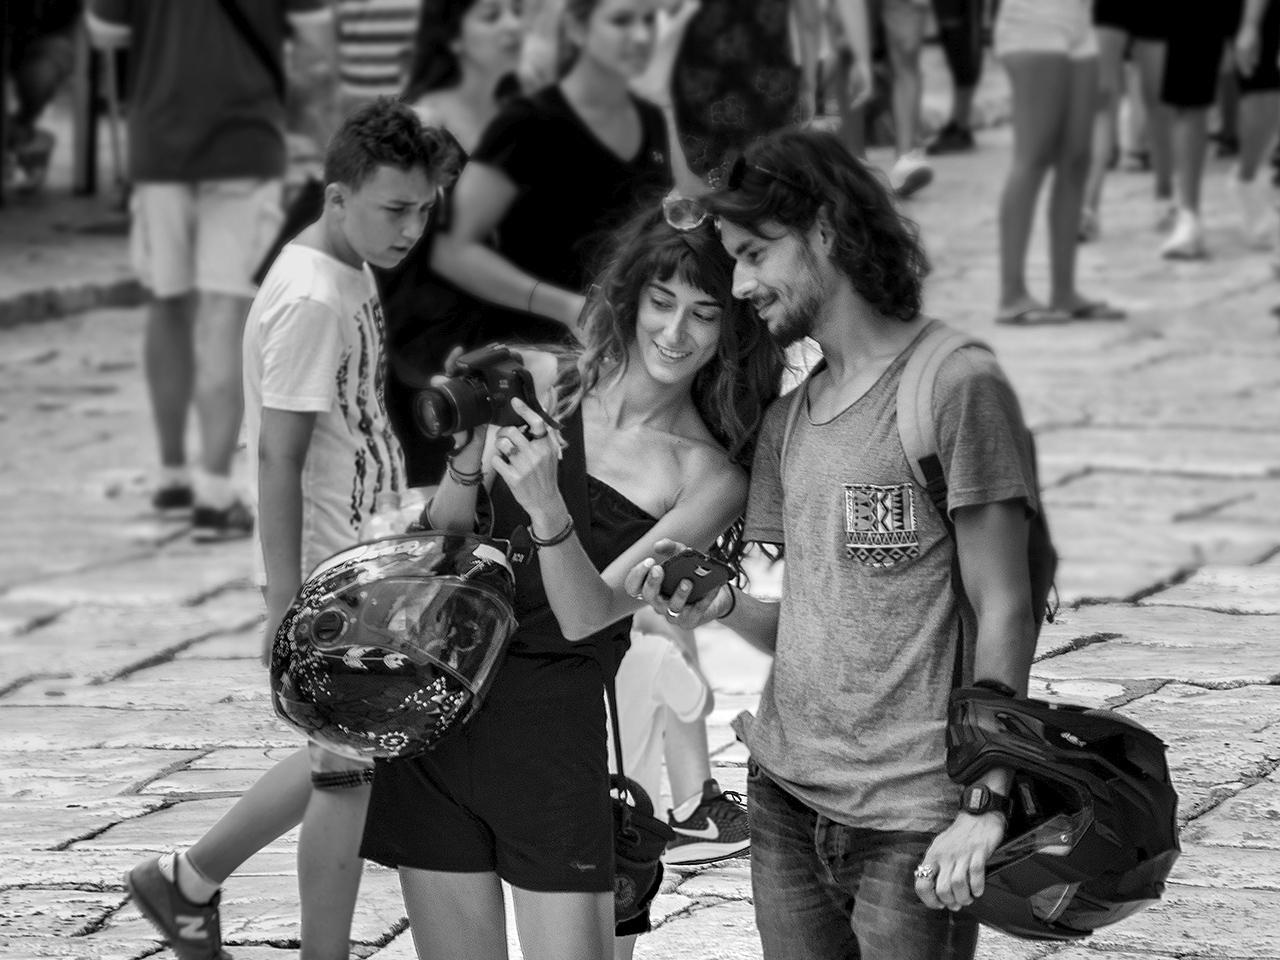 Turista pár